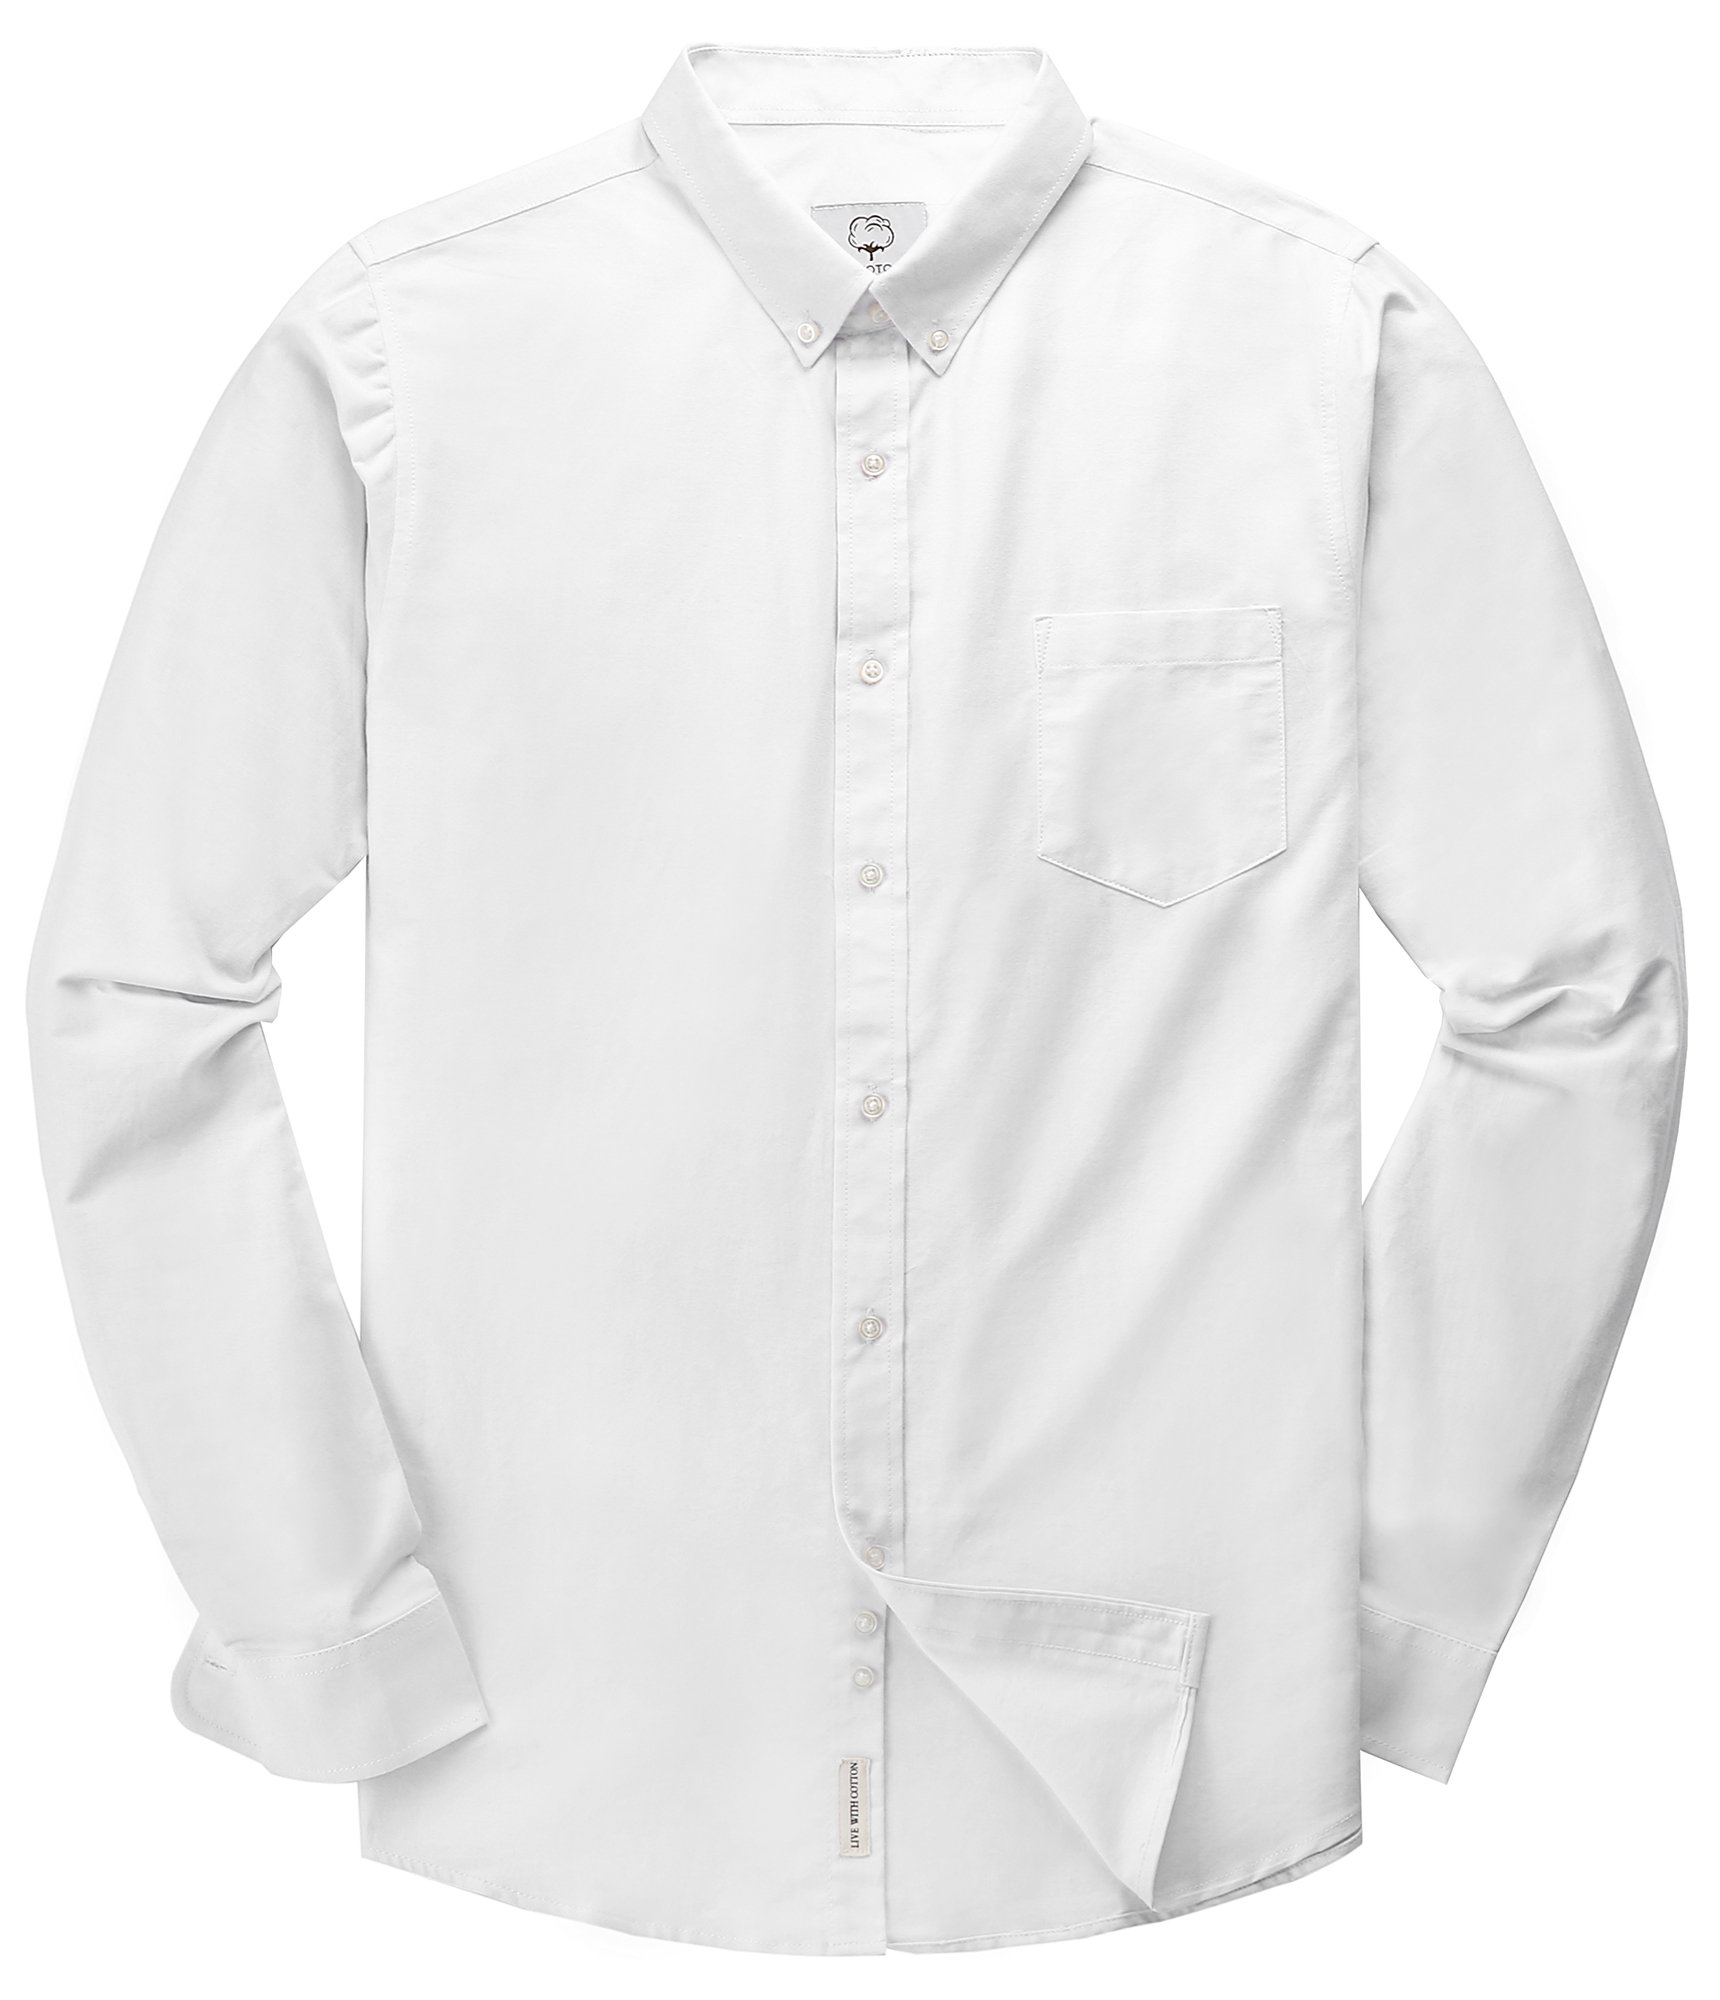 Men's Oxford Long Sleeve Button Down Dress Shirt,White,Medium